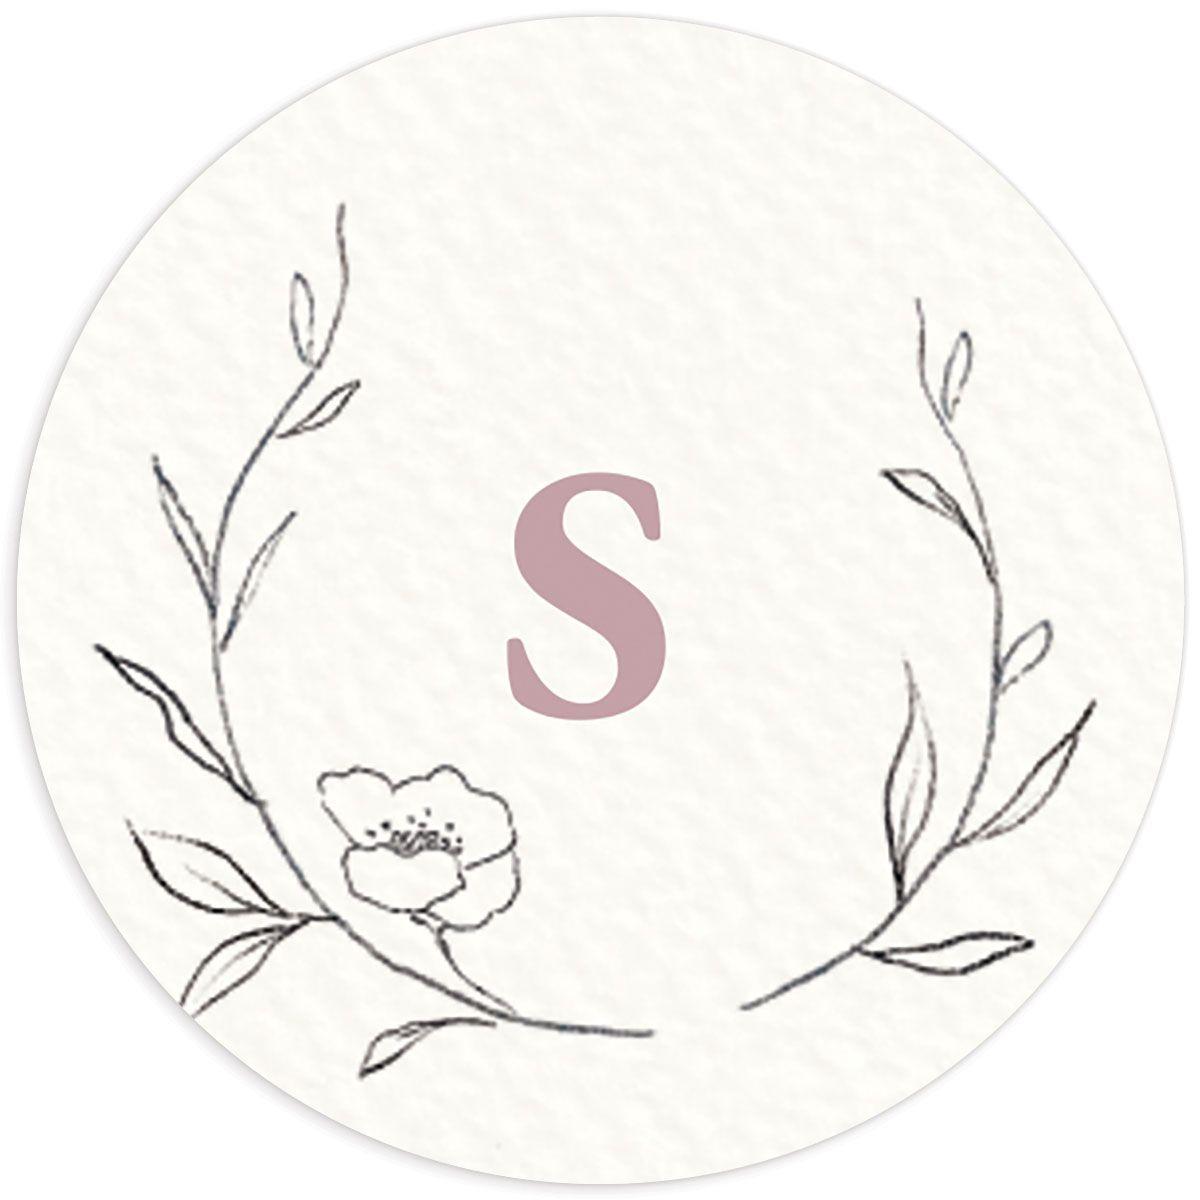 Graceful Botanical Wedding Sticker in pink